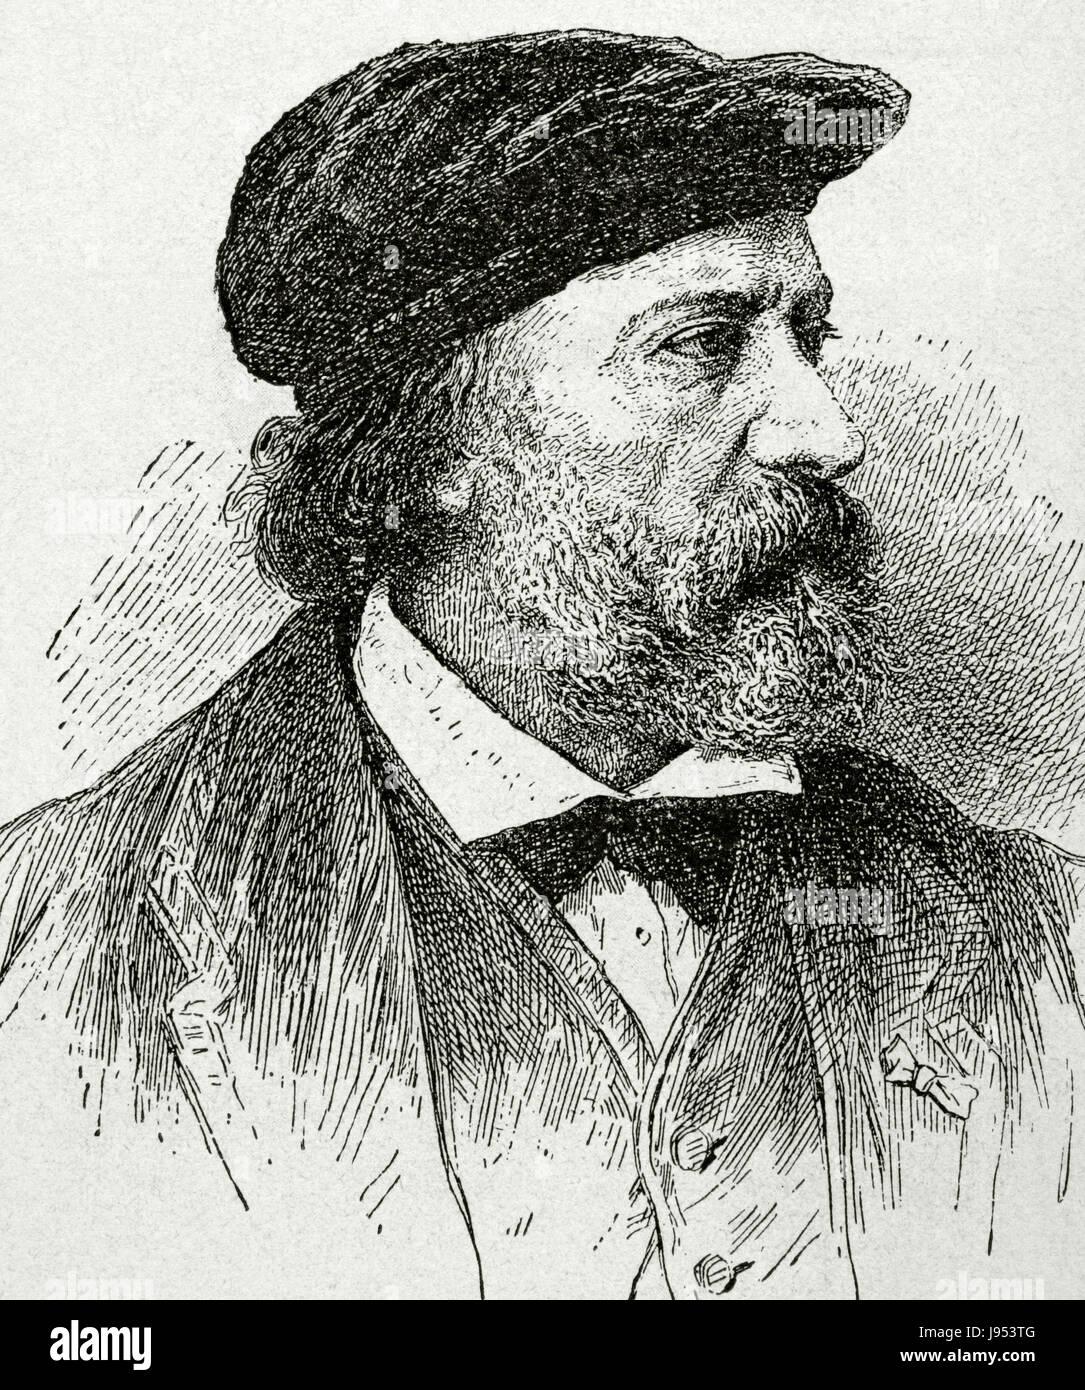 Charles-François Daubigny (1817-1878). French painter. Barbizon school. He is considered an important precursor - Stock Image